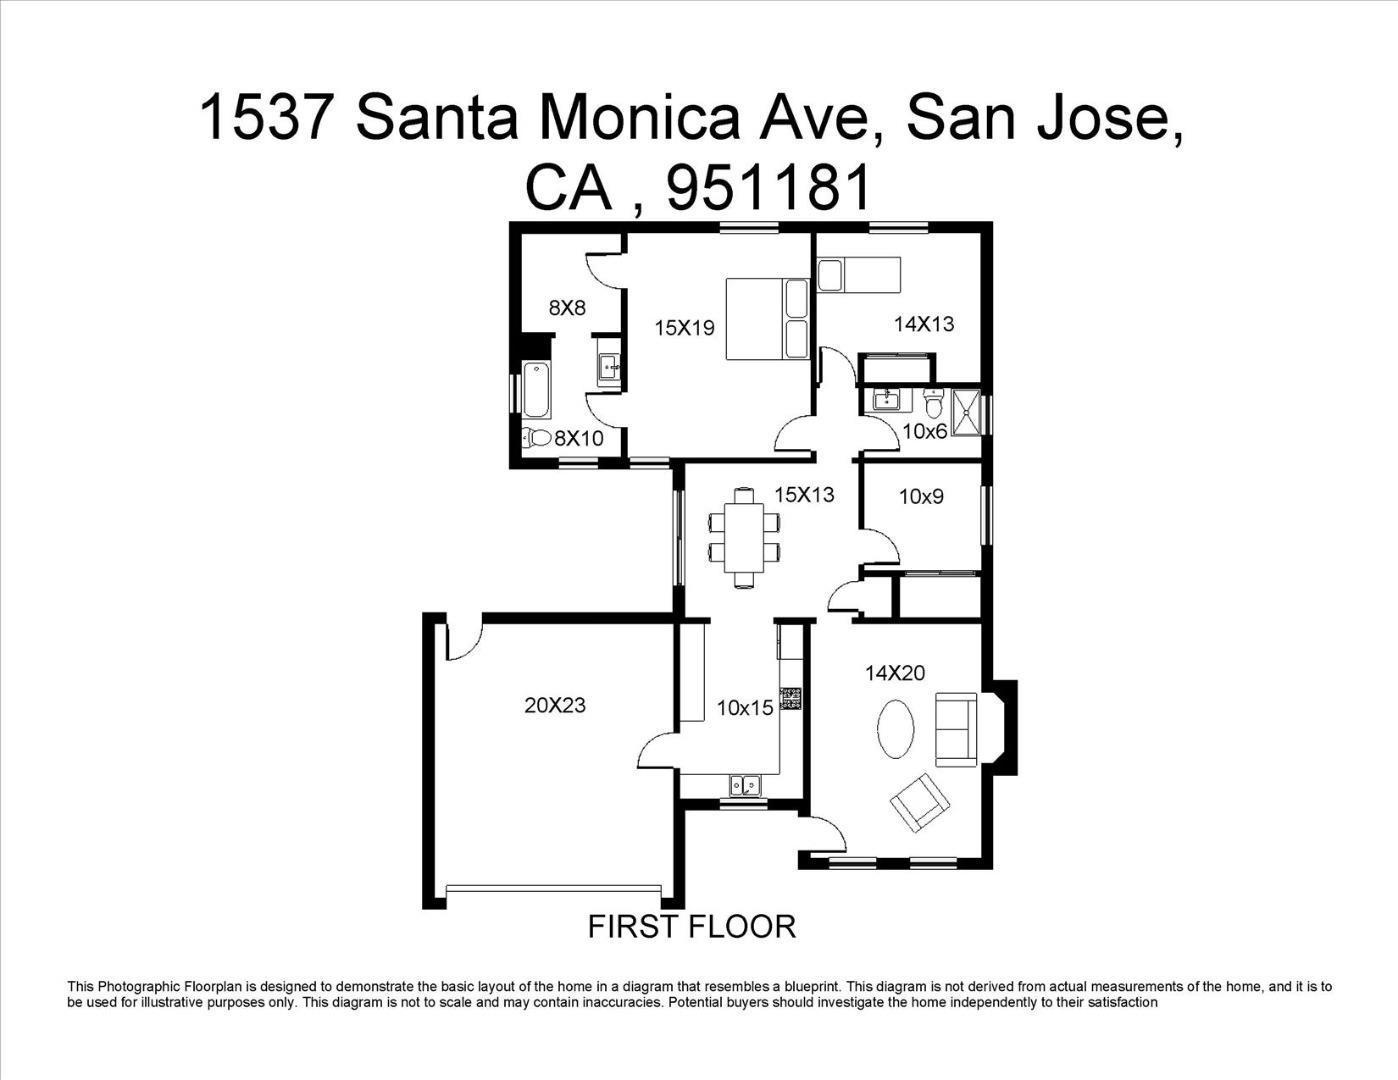 1537 Santa Monica AVE photo